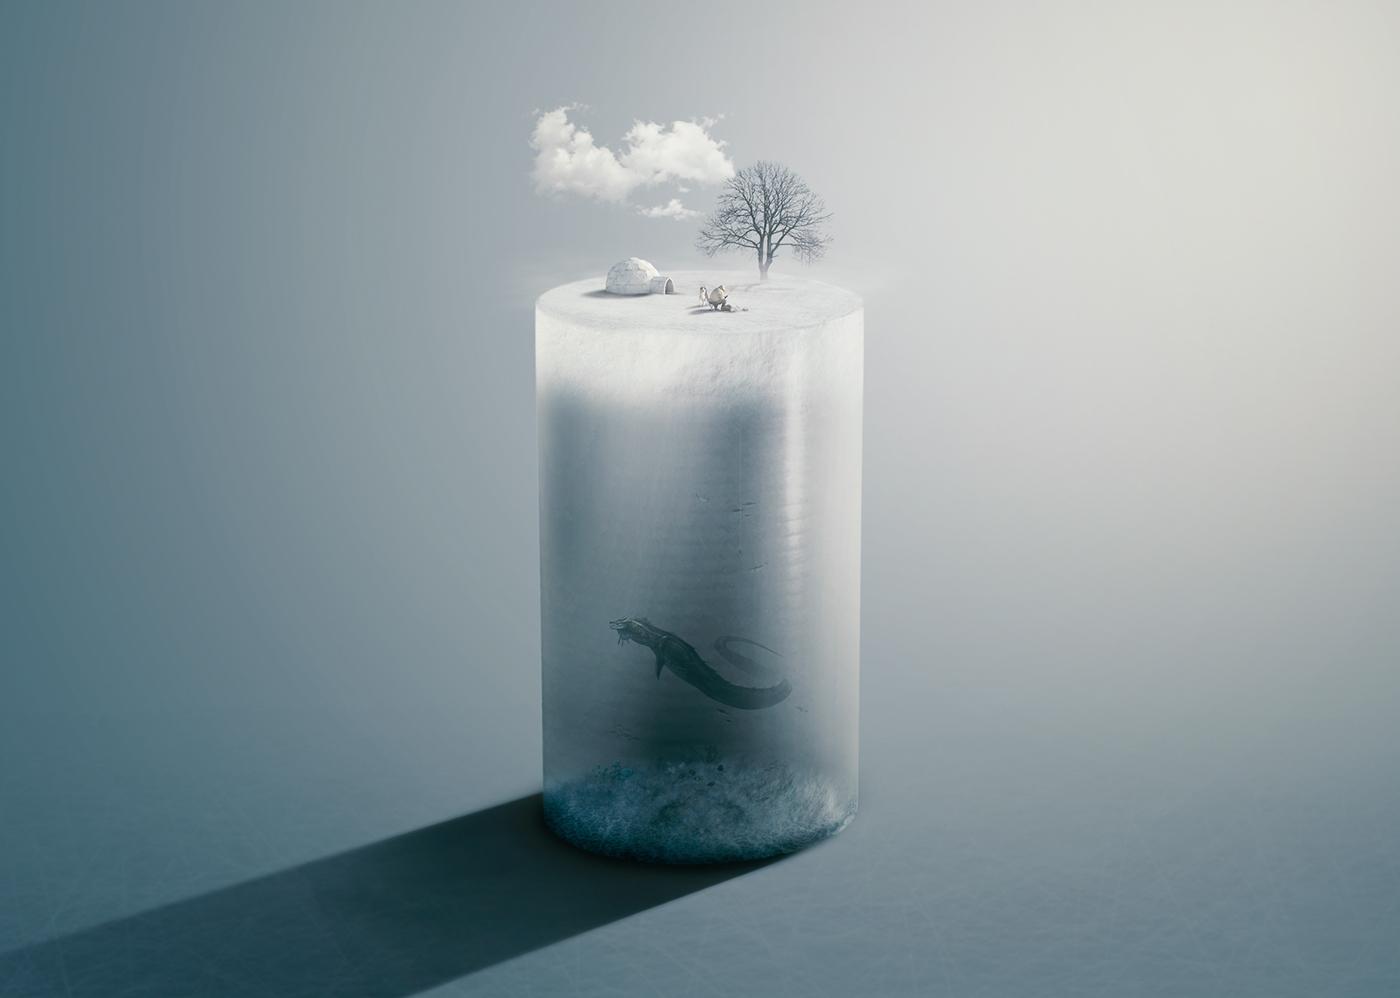 Deep Ice Fishing Photo Manipulation in Photoshop